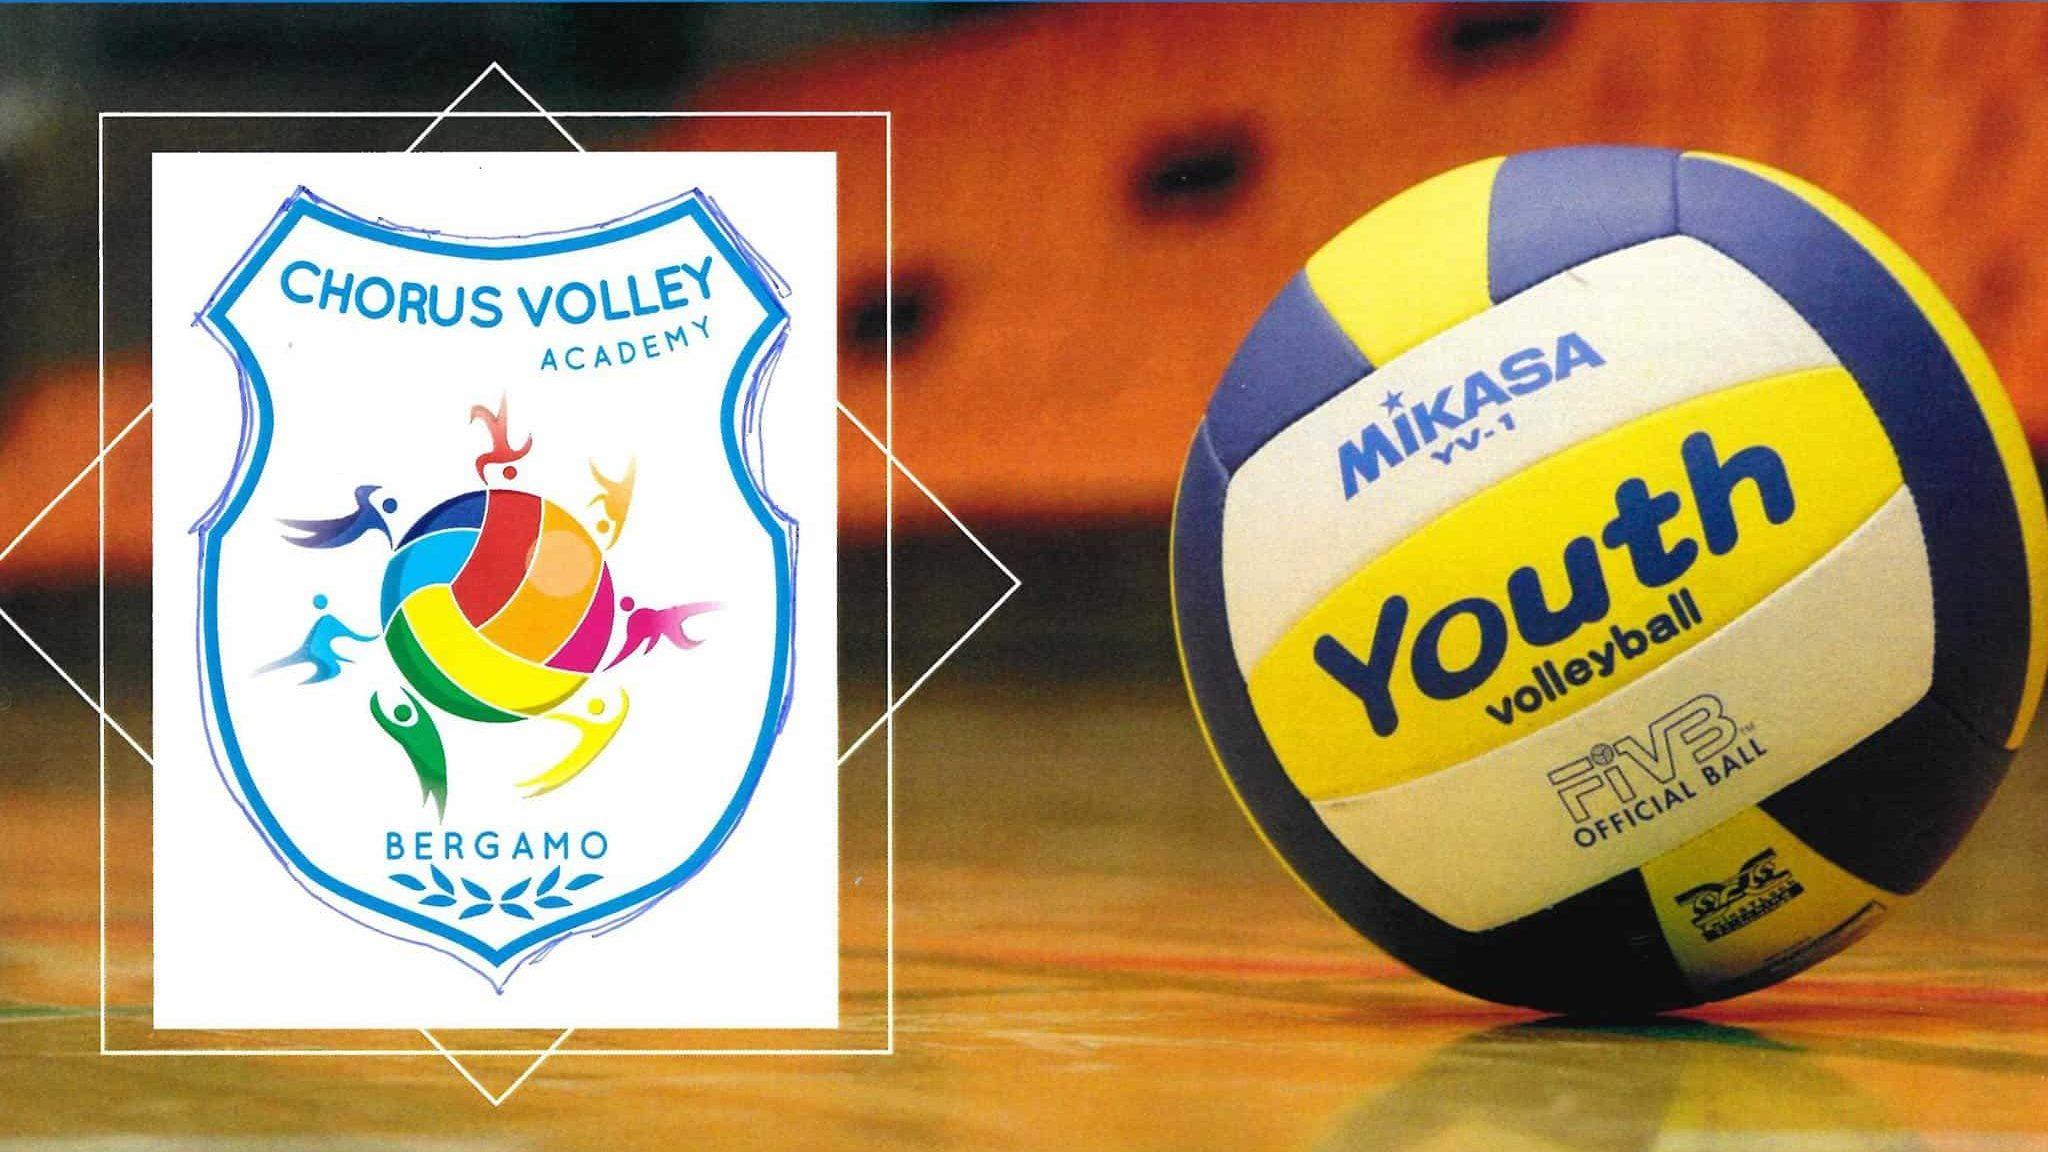 Chorus Volley Bergamo Academy